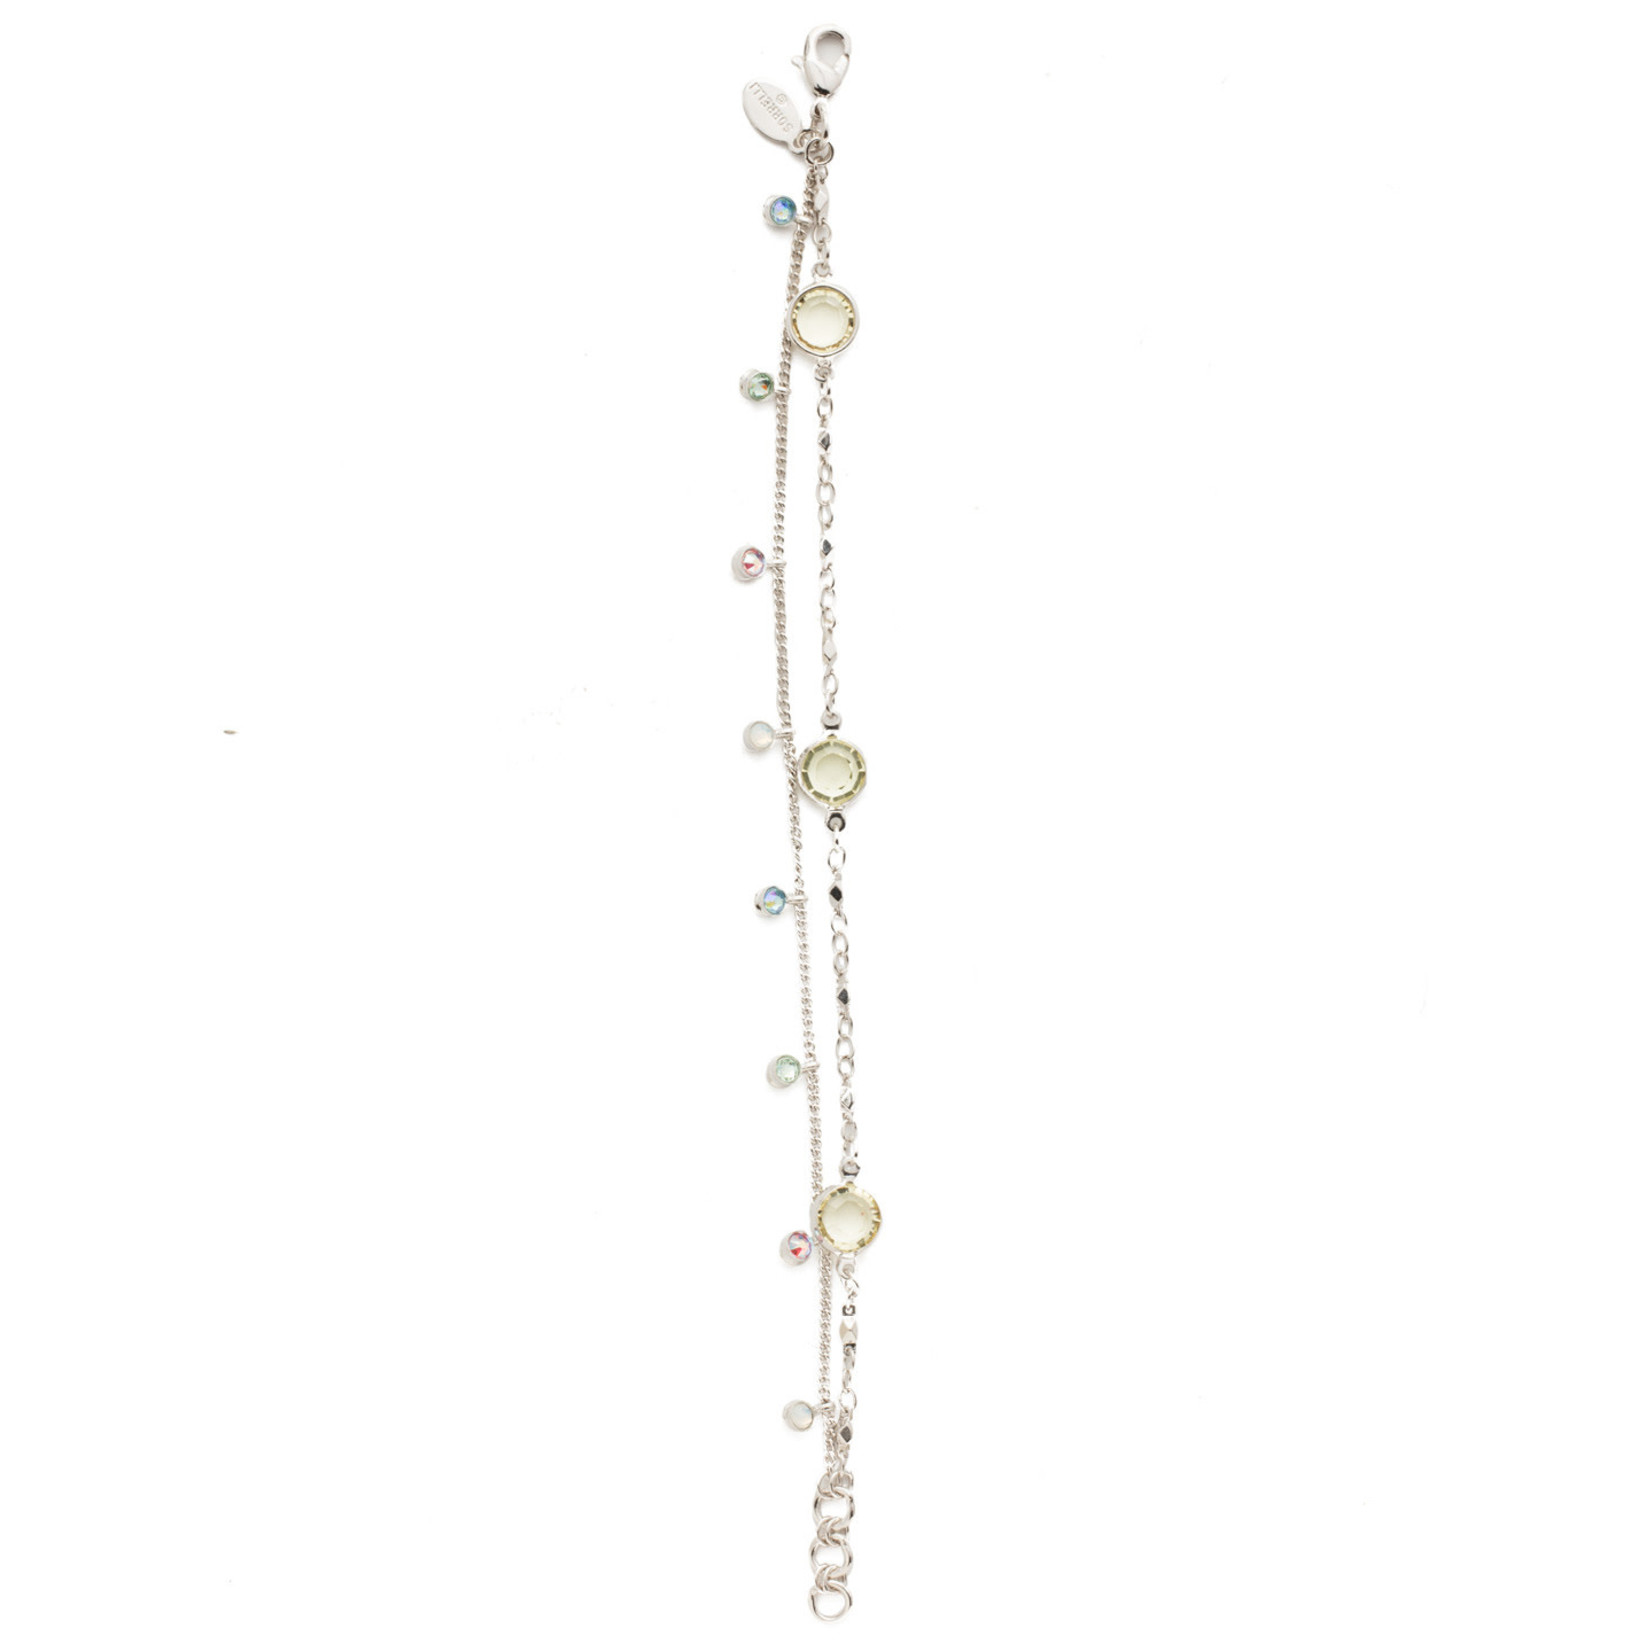 Sorrelli Sorrelli Dewdrop Tennis Bracelet in Rhodium Seersucker